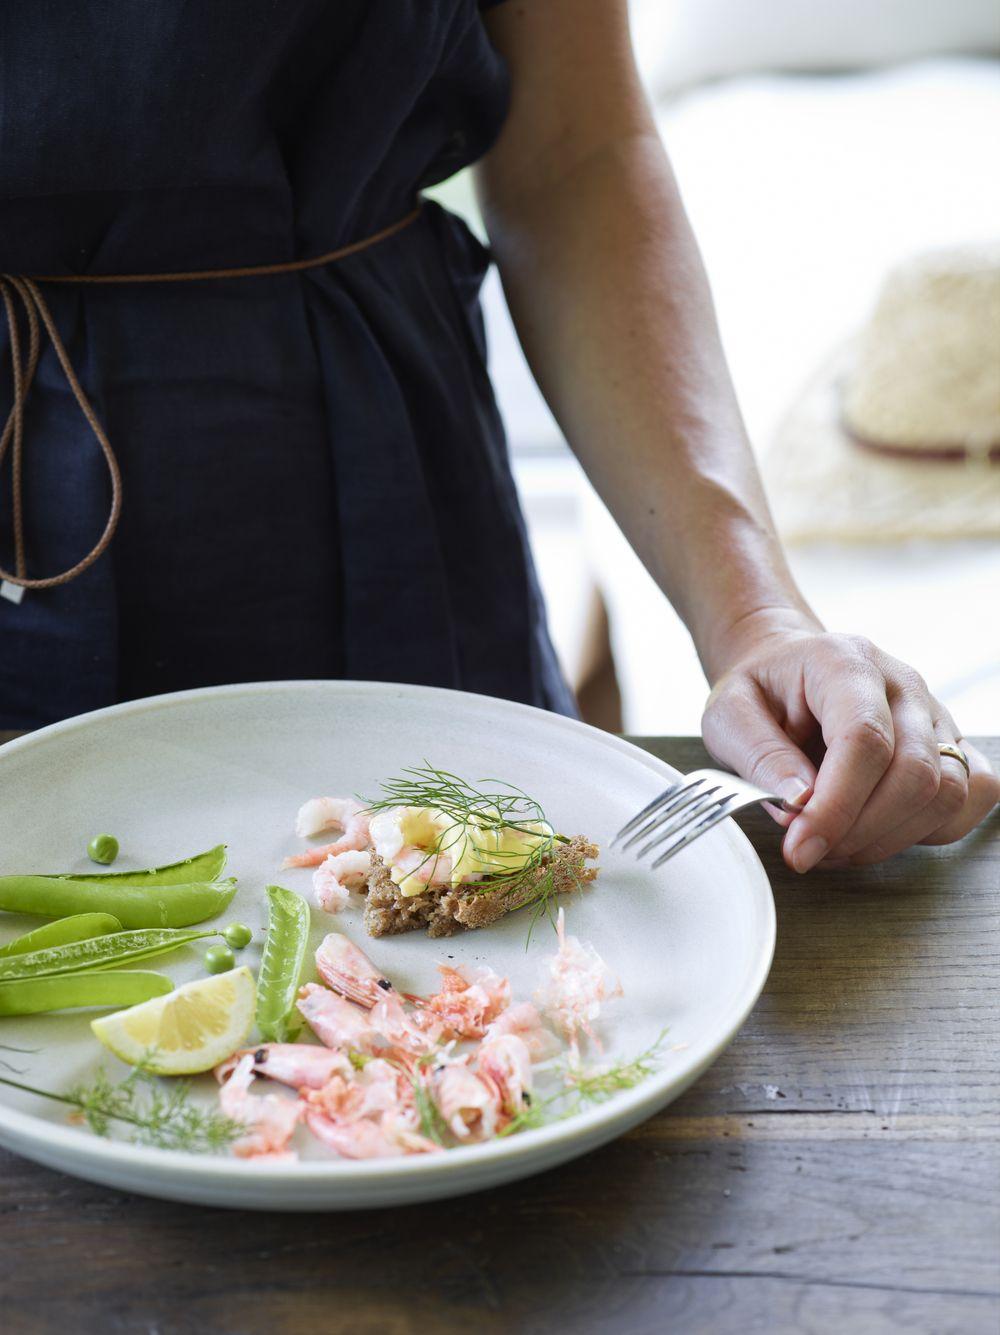 Trash cooking. Shrimps, peas, summer. Stine Christiansen & Mette Helbæk.